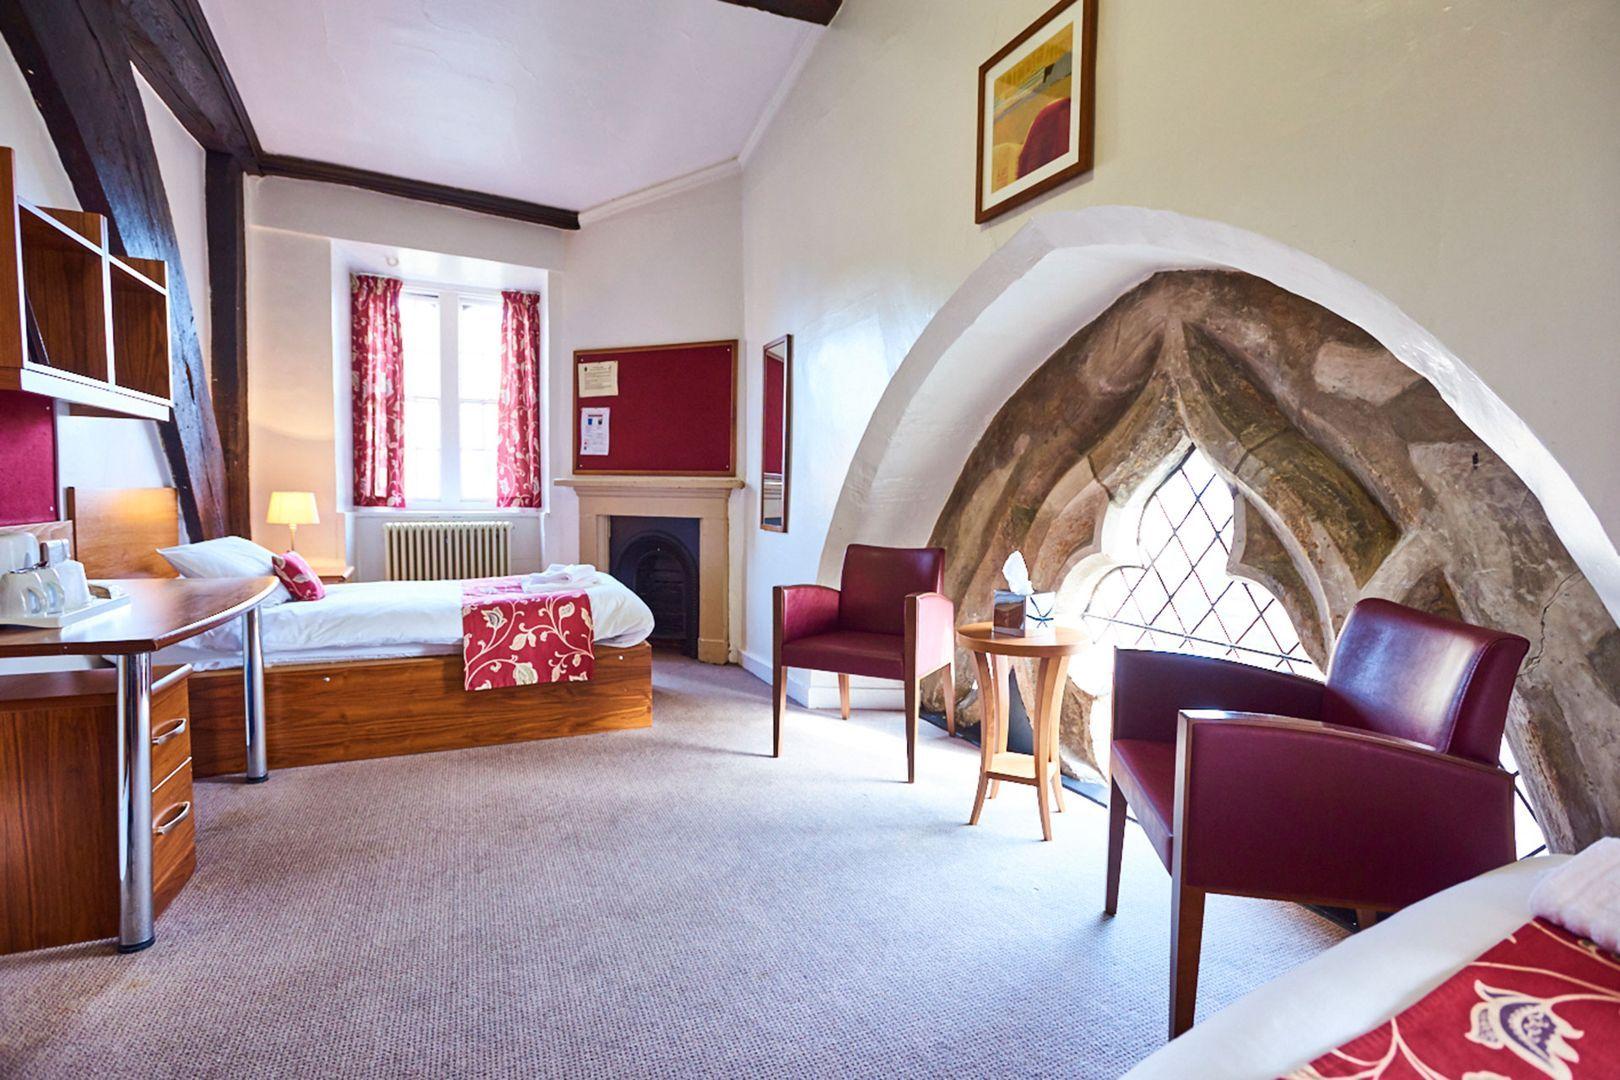 The Poshest University Hall In Uk Durham Room Bedroom Apartment Bristol Accommodation Personal Statement